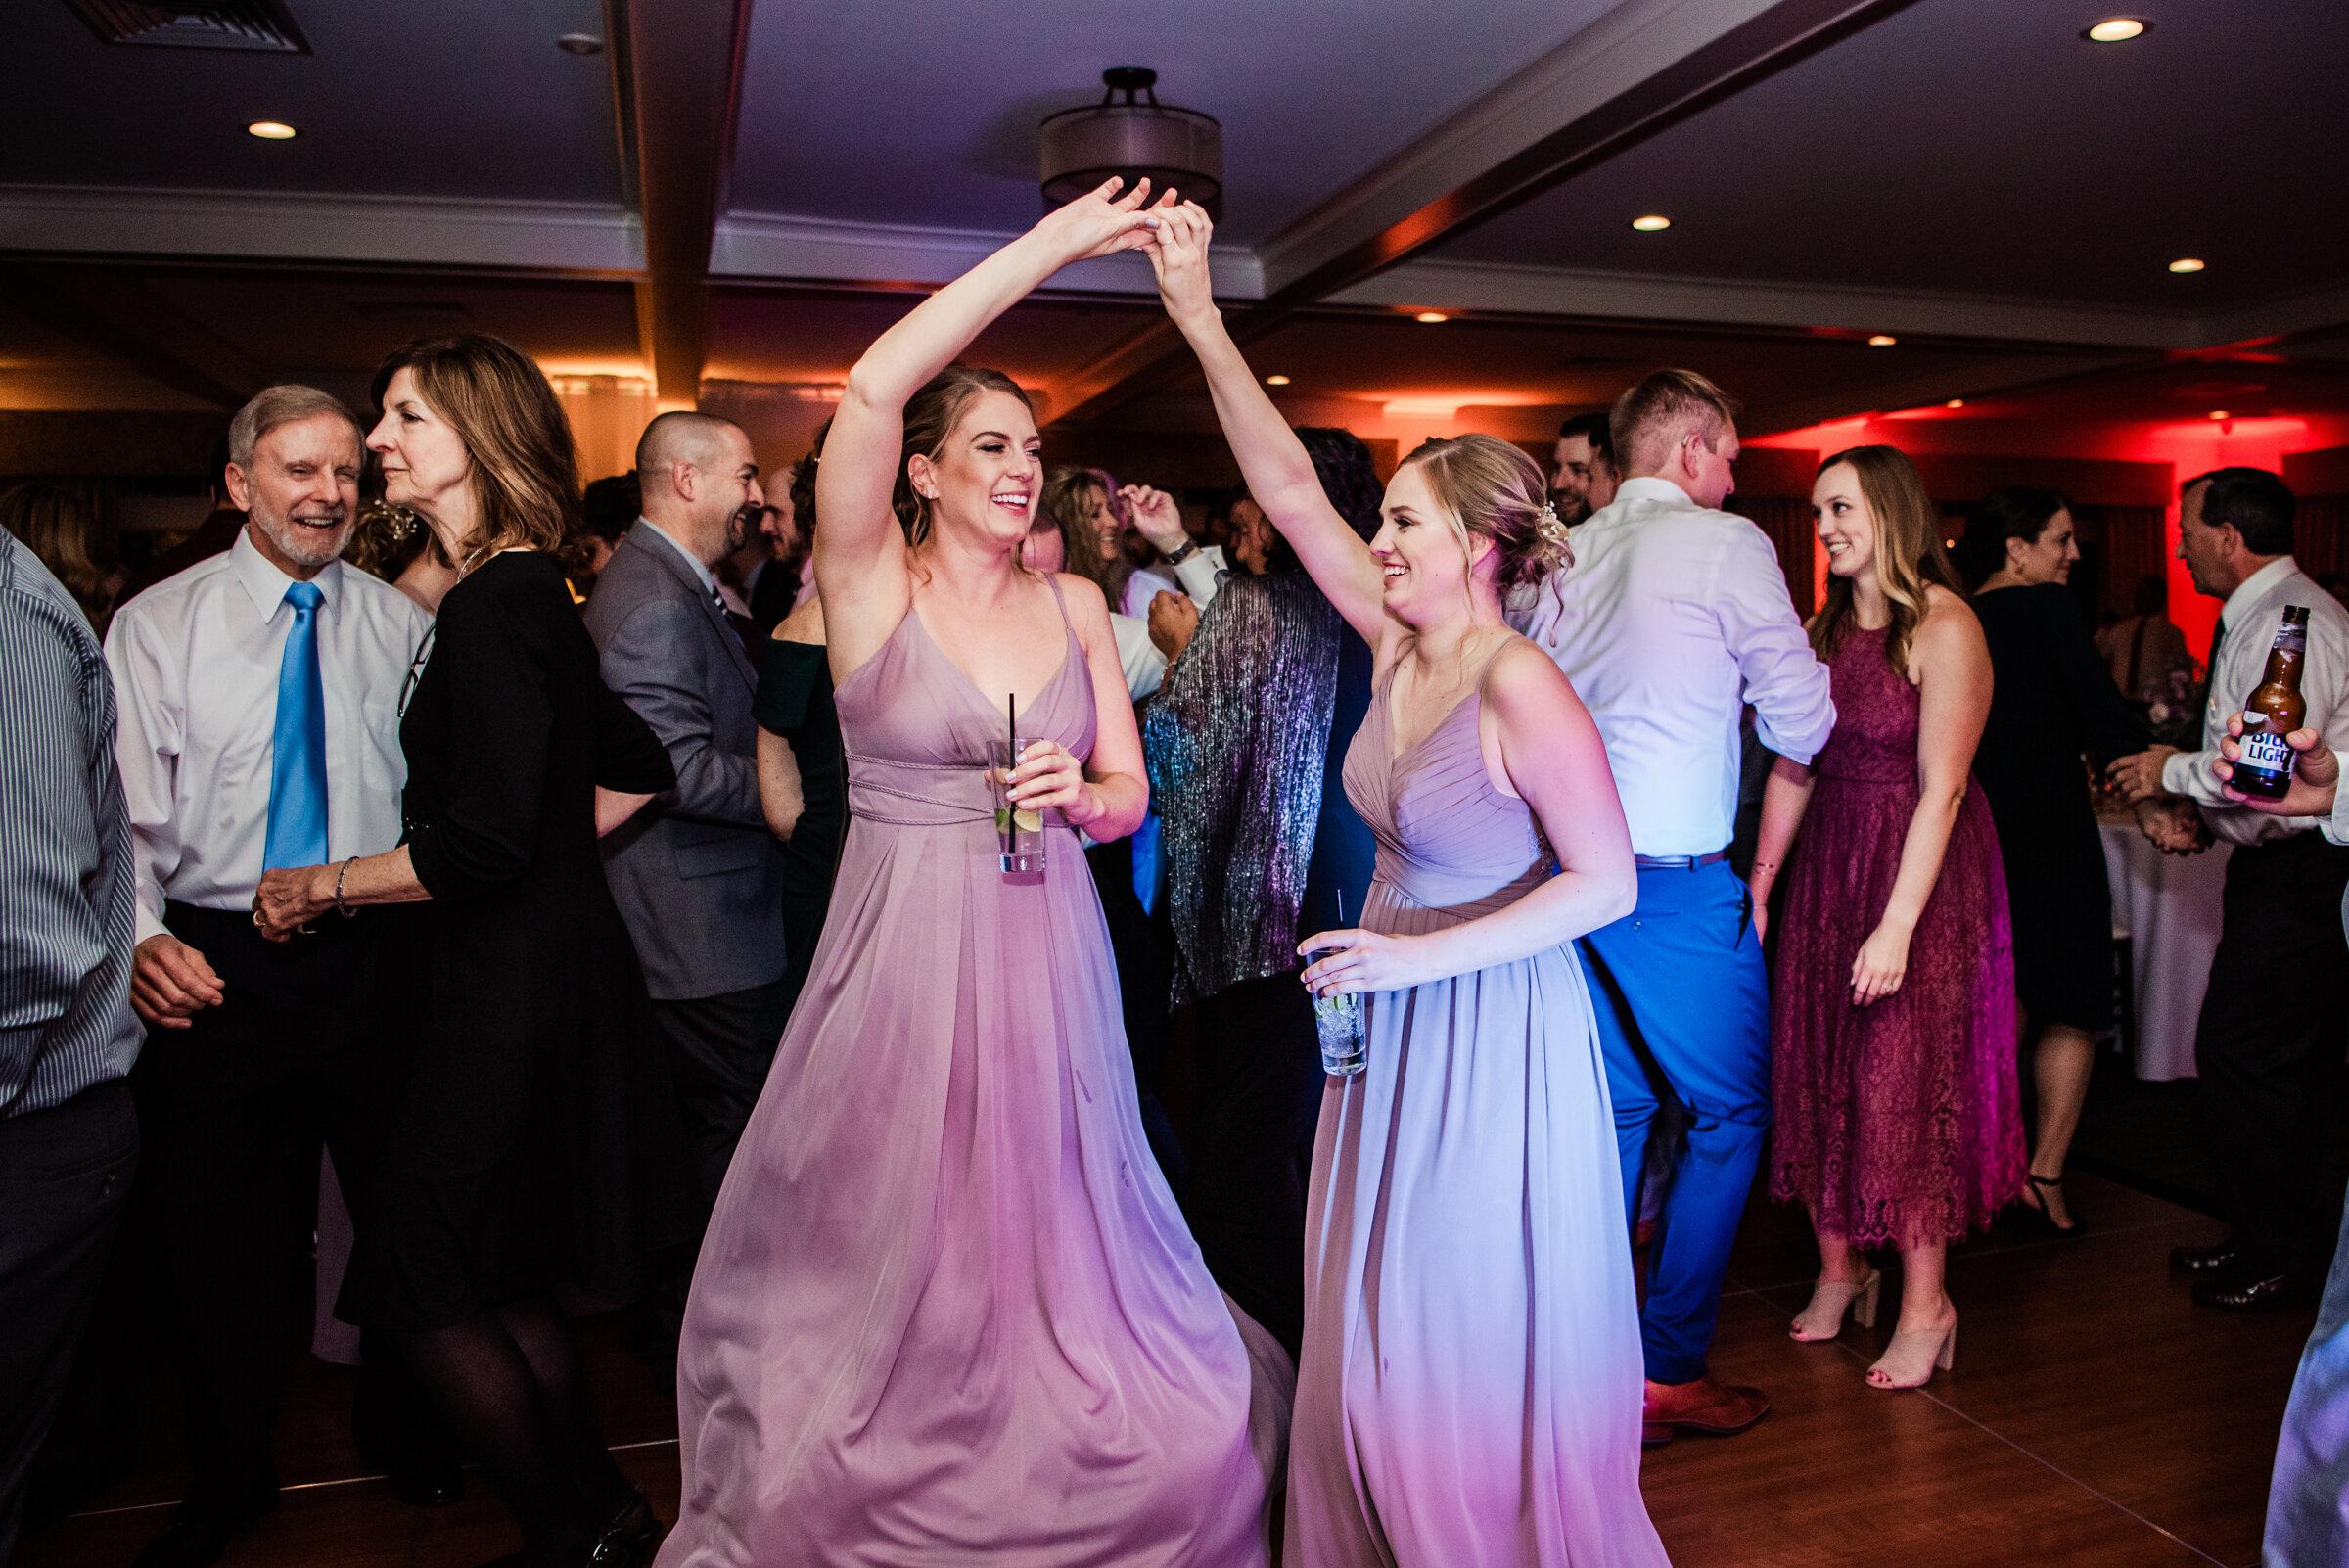 Deerfield_Country_Club_Rochester_Wedding_JILL_STUDIO_Rochester_NY_Photographer_DSC_7454.jpg